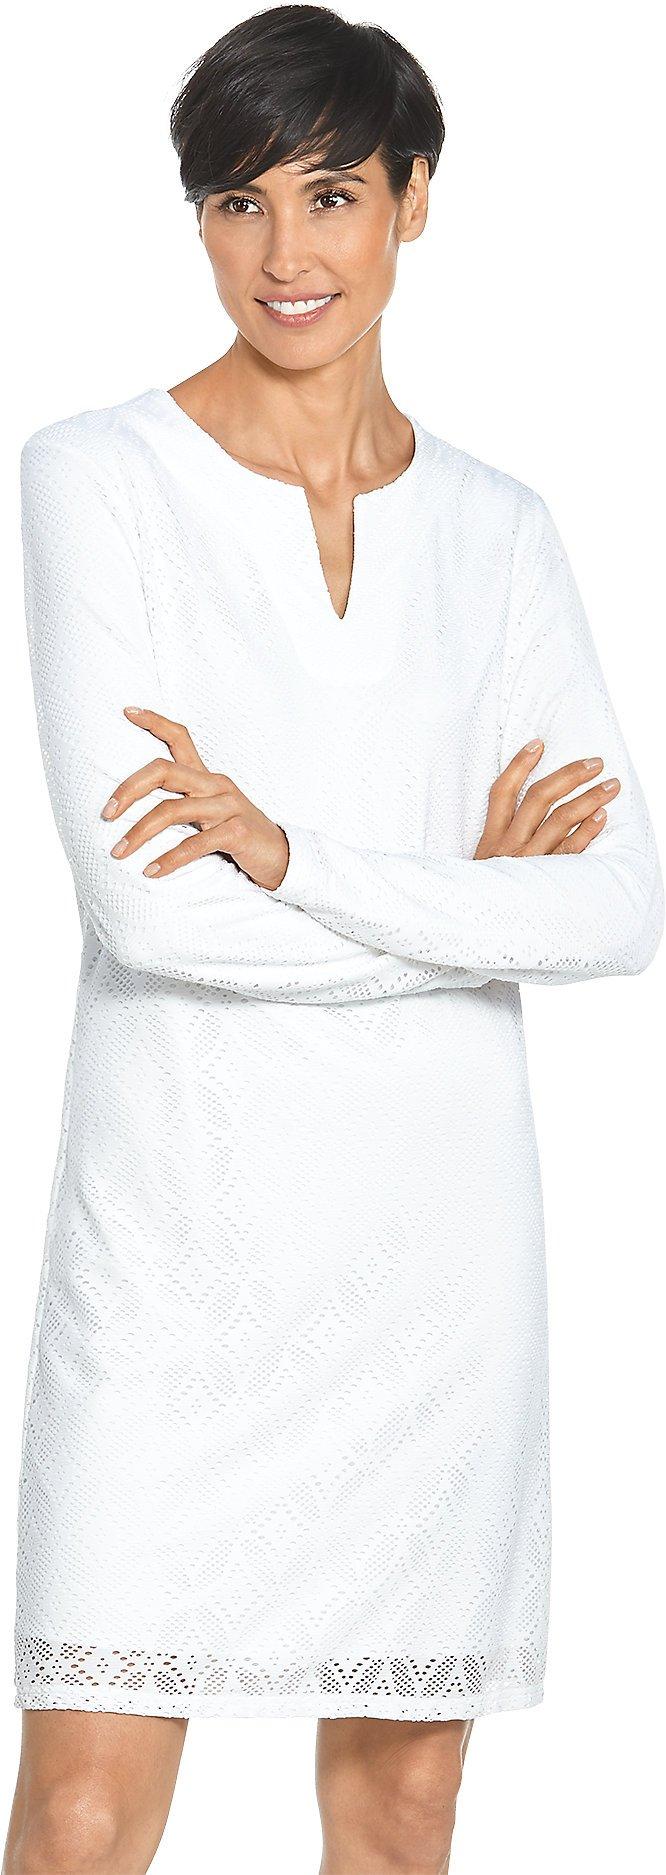 Coolibar UPF 50+ Women's Crochet Tunic - Sun Protective (Medium- Seashell White)